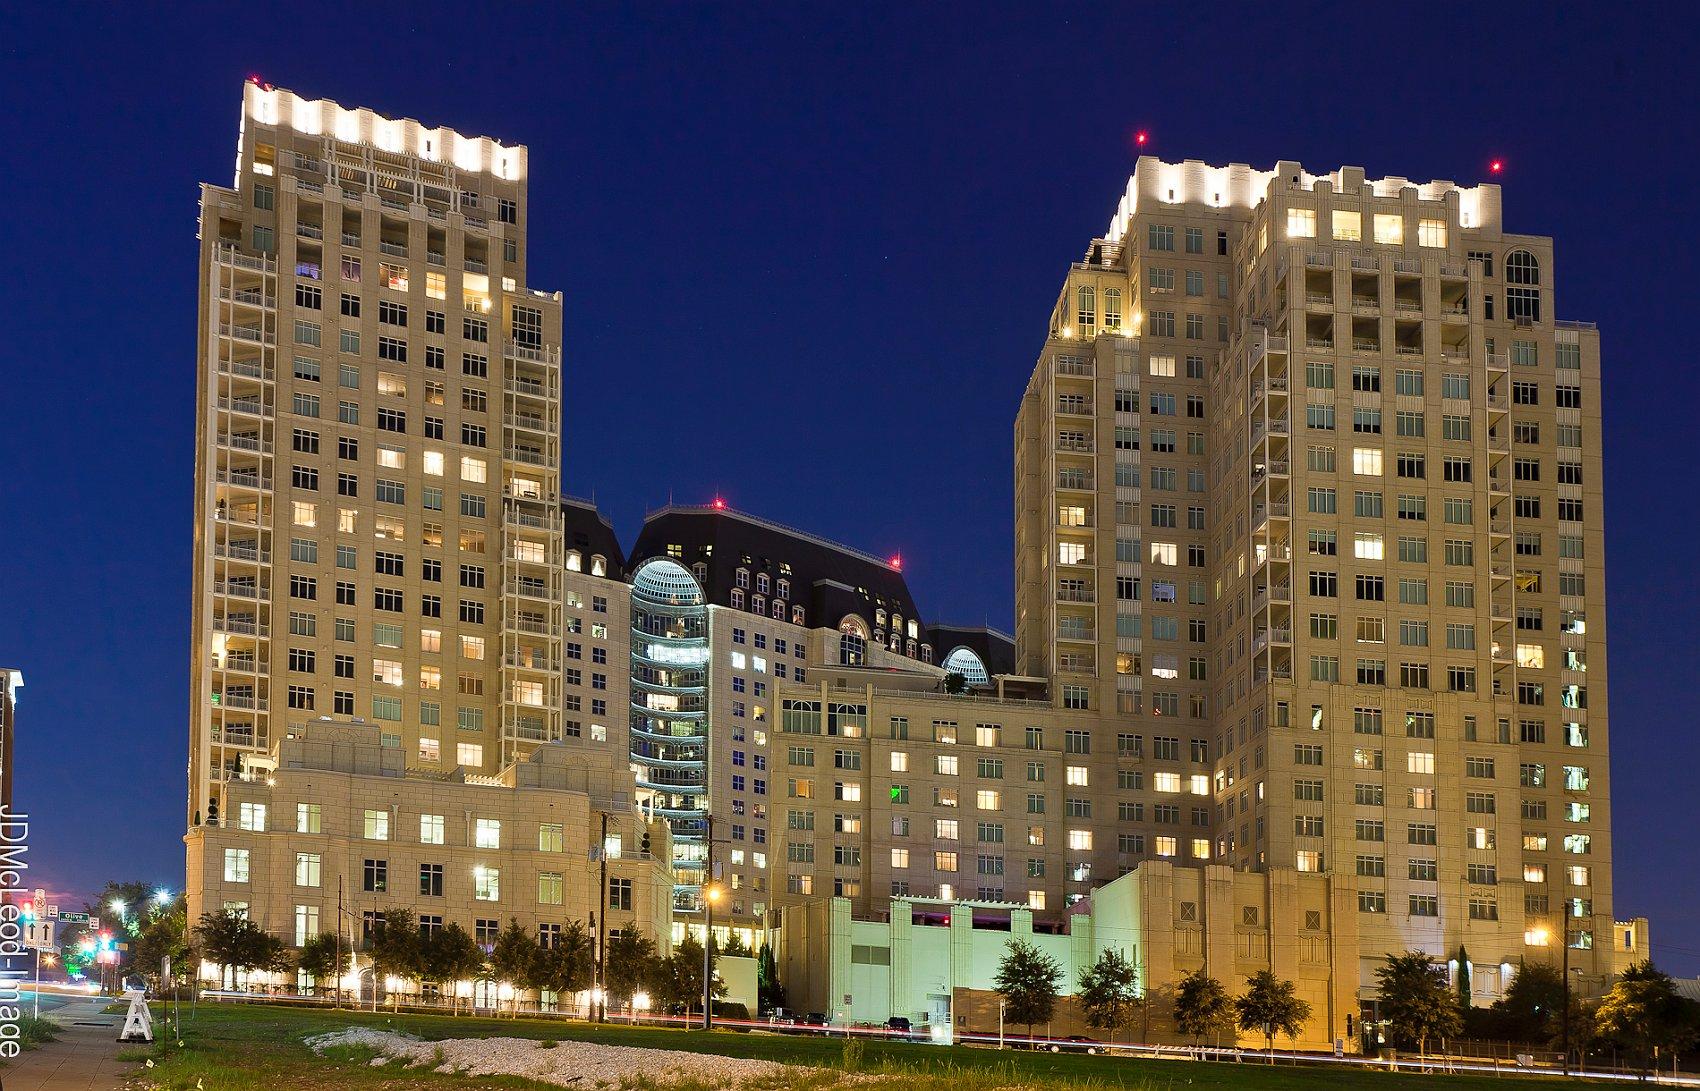 Ritz-Carlton Dallas